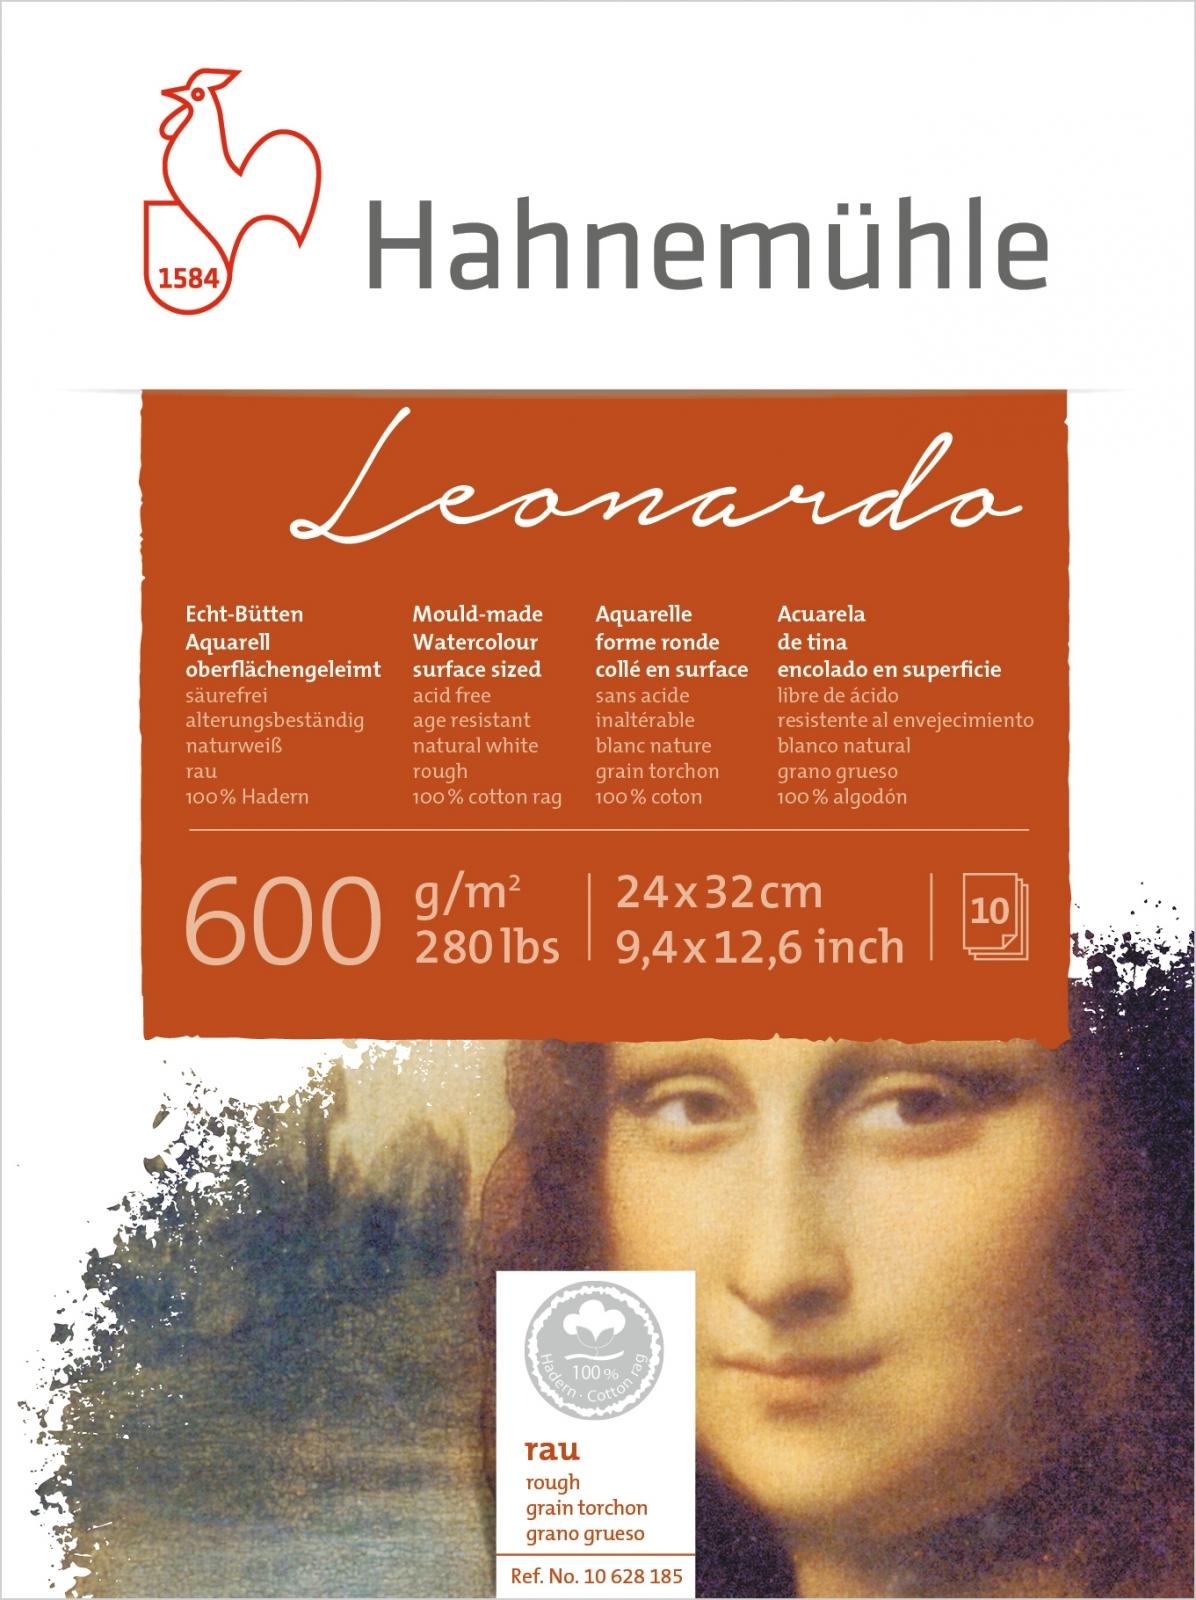 Papel Hahnemuhle Leonardo Textura Rugosa 600g/m2 24x32 10fls - Papelaria Botafogo